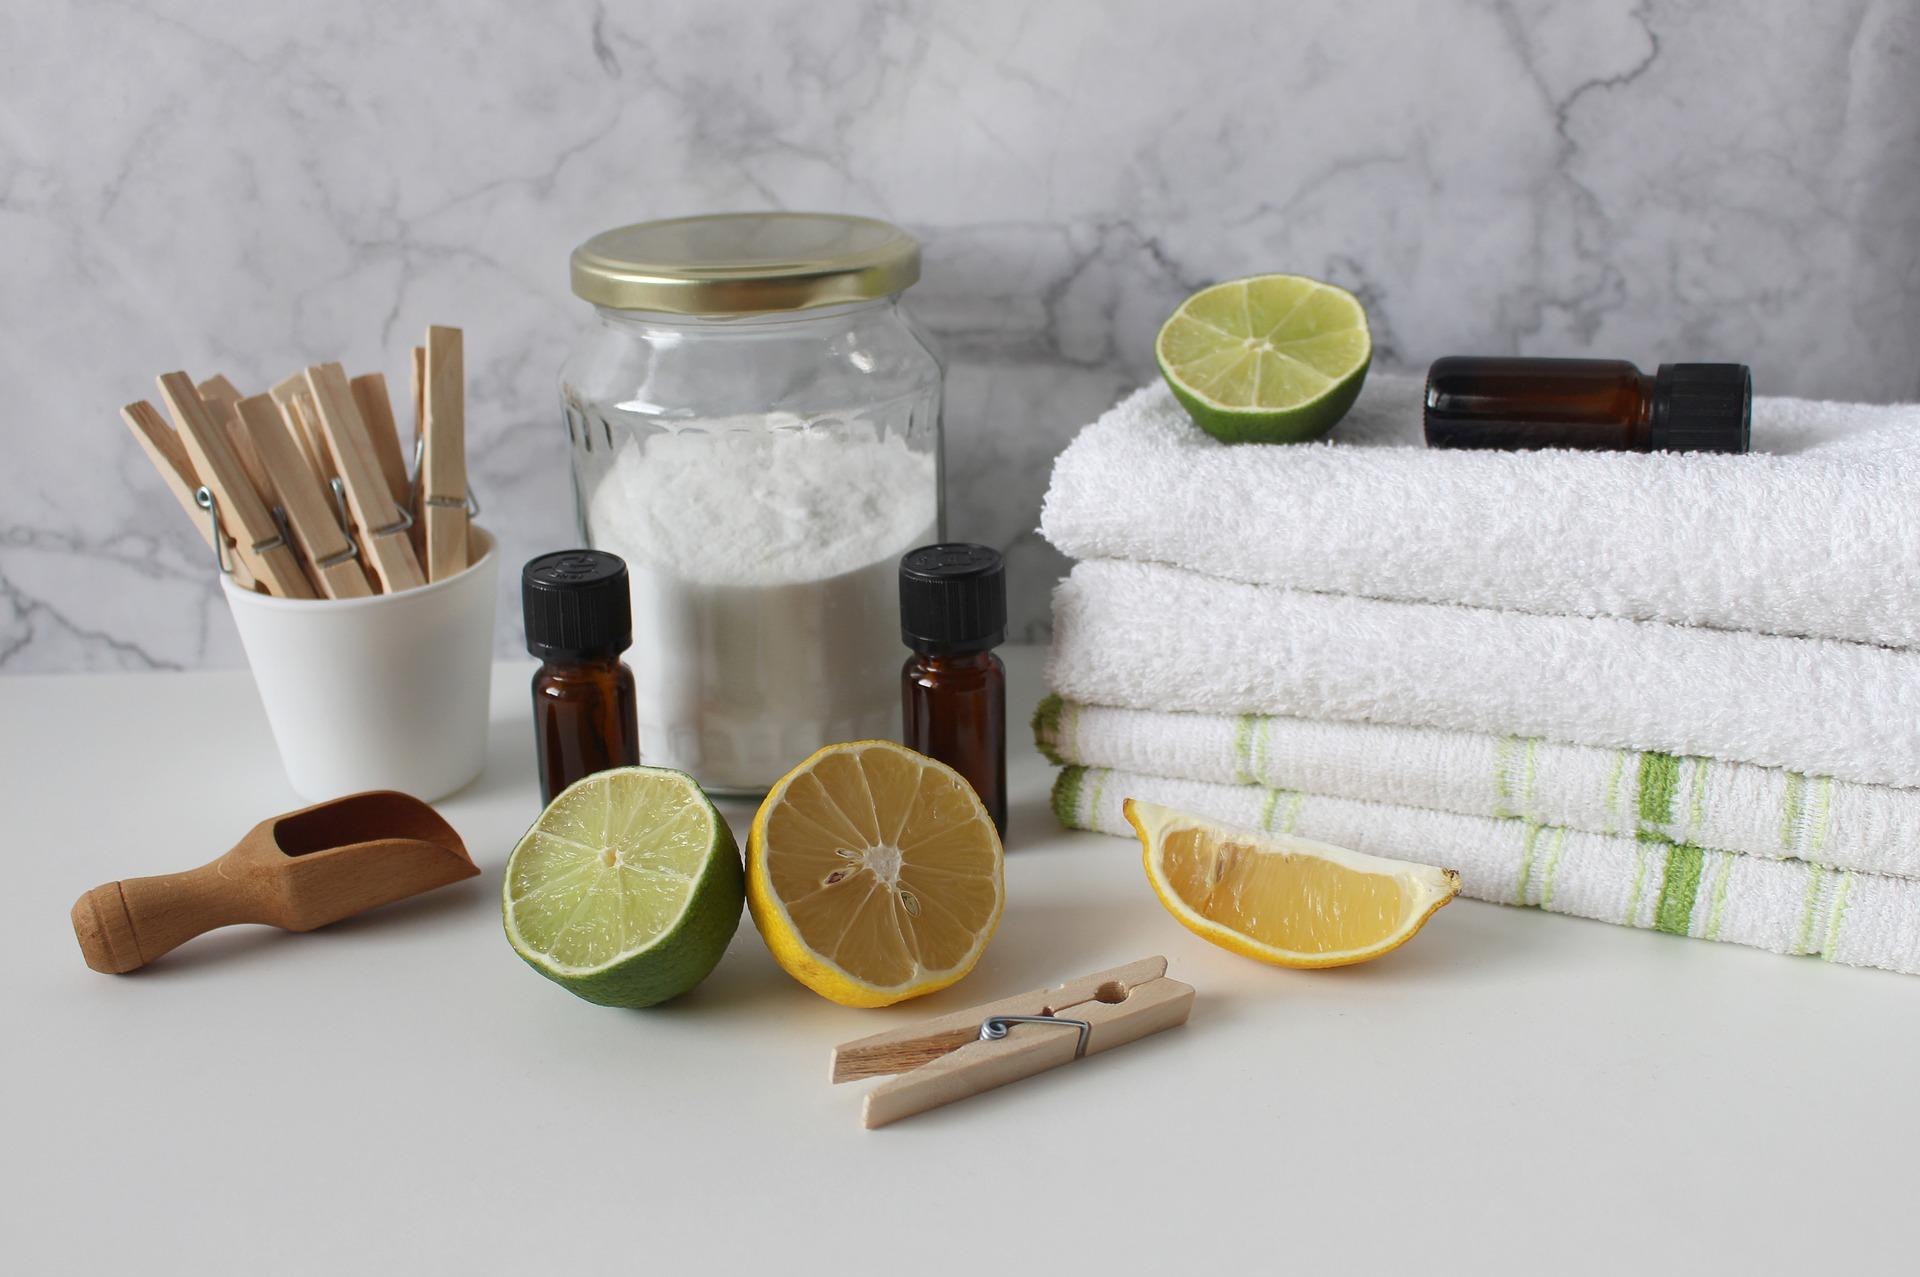 Exfoliating your skin with baking soda